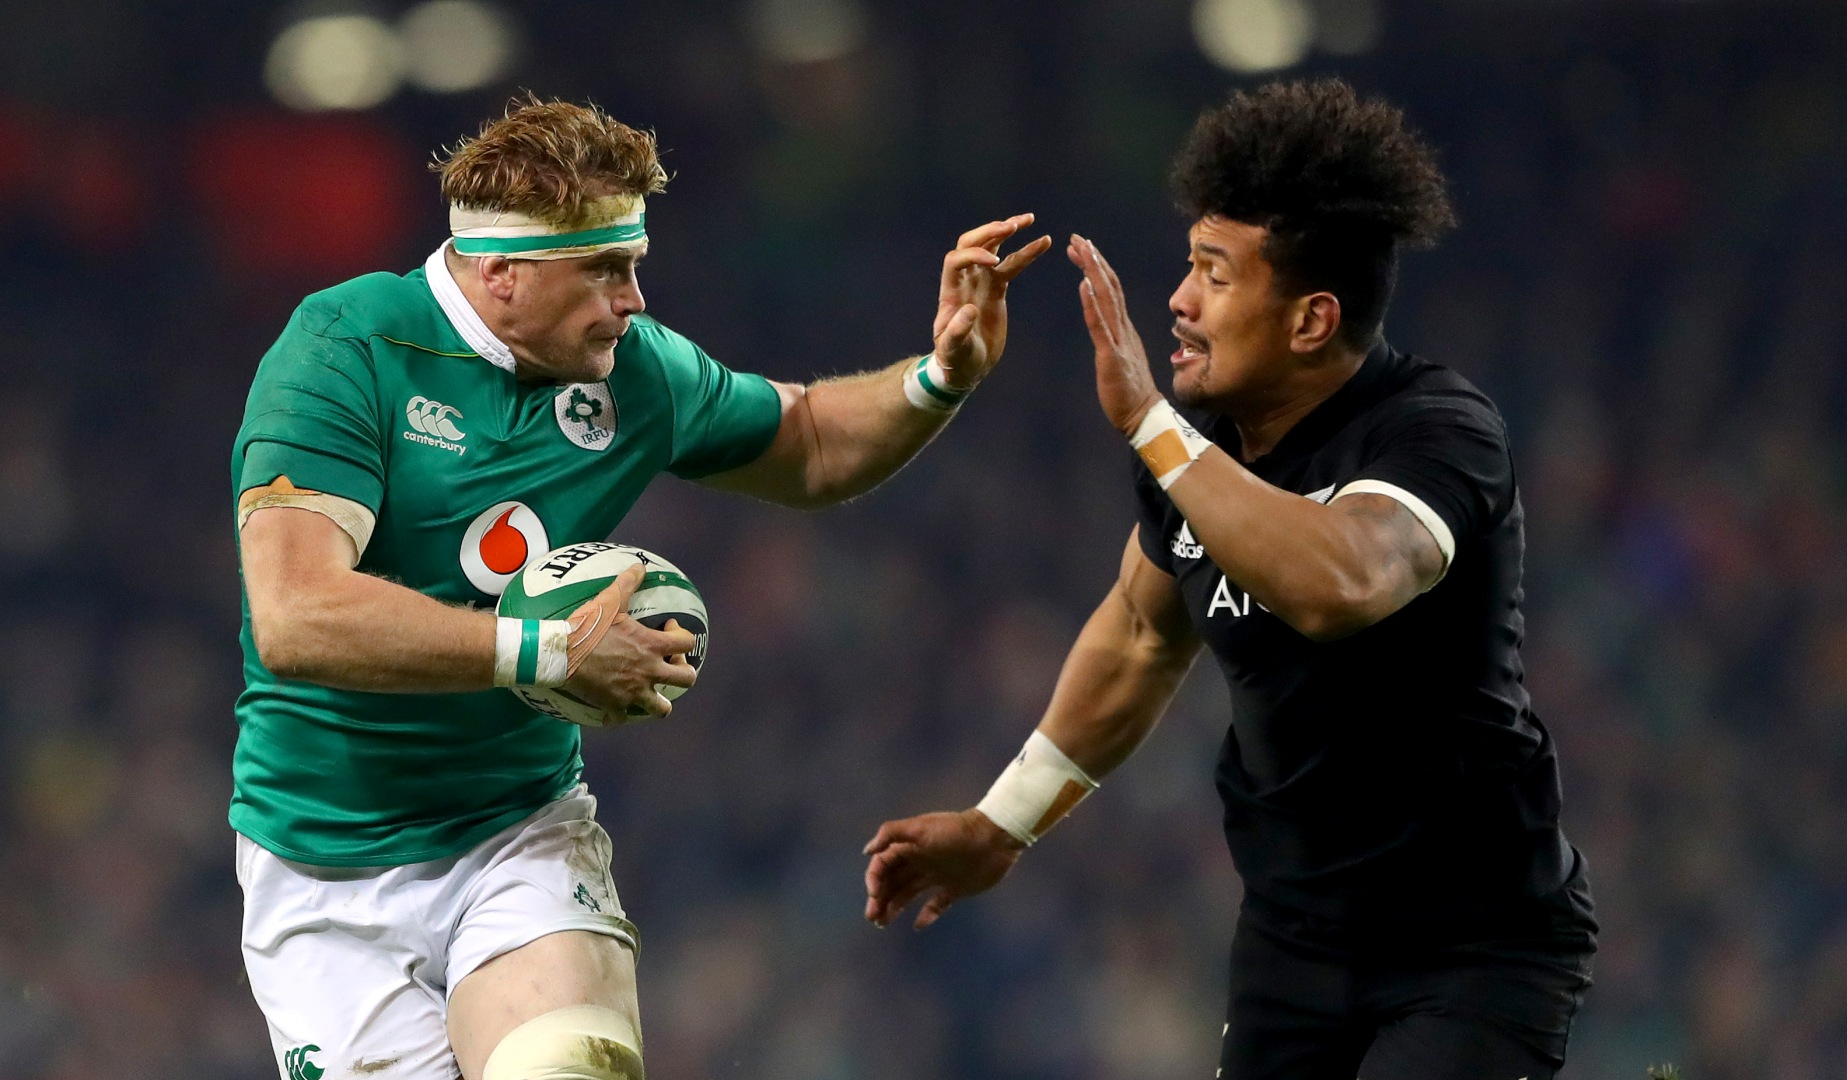 LionsWatch: Ireland fall short in All Blacks Dublin clash